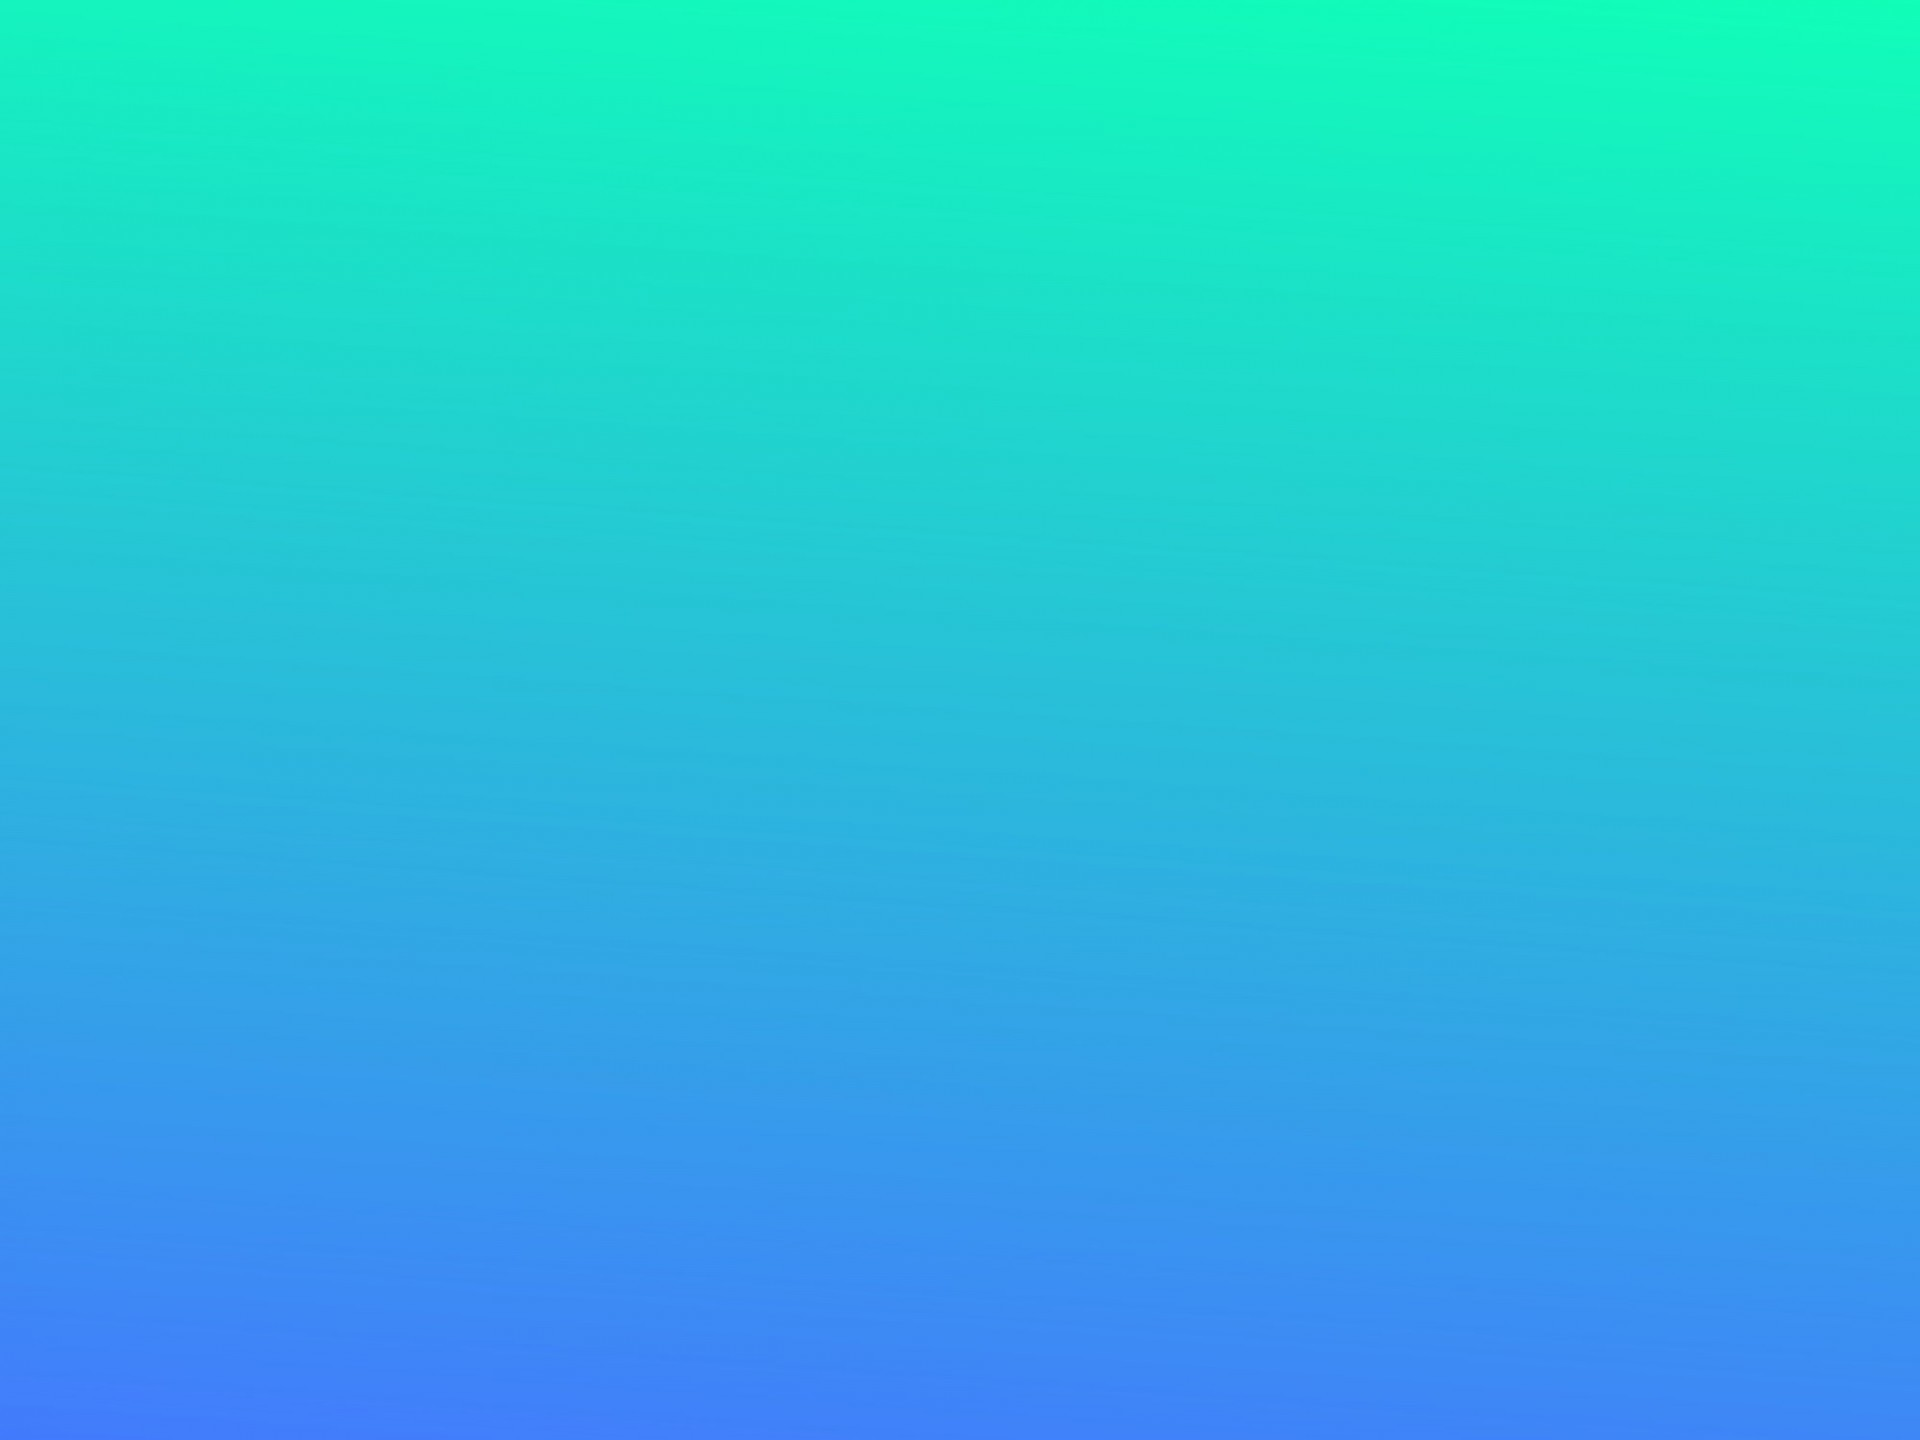 Res: 1920x1440, Aqua Blue Gradient Background